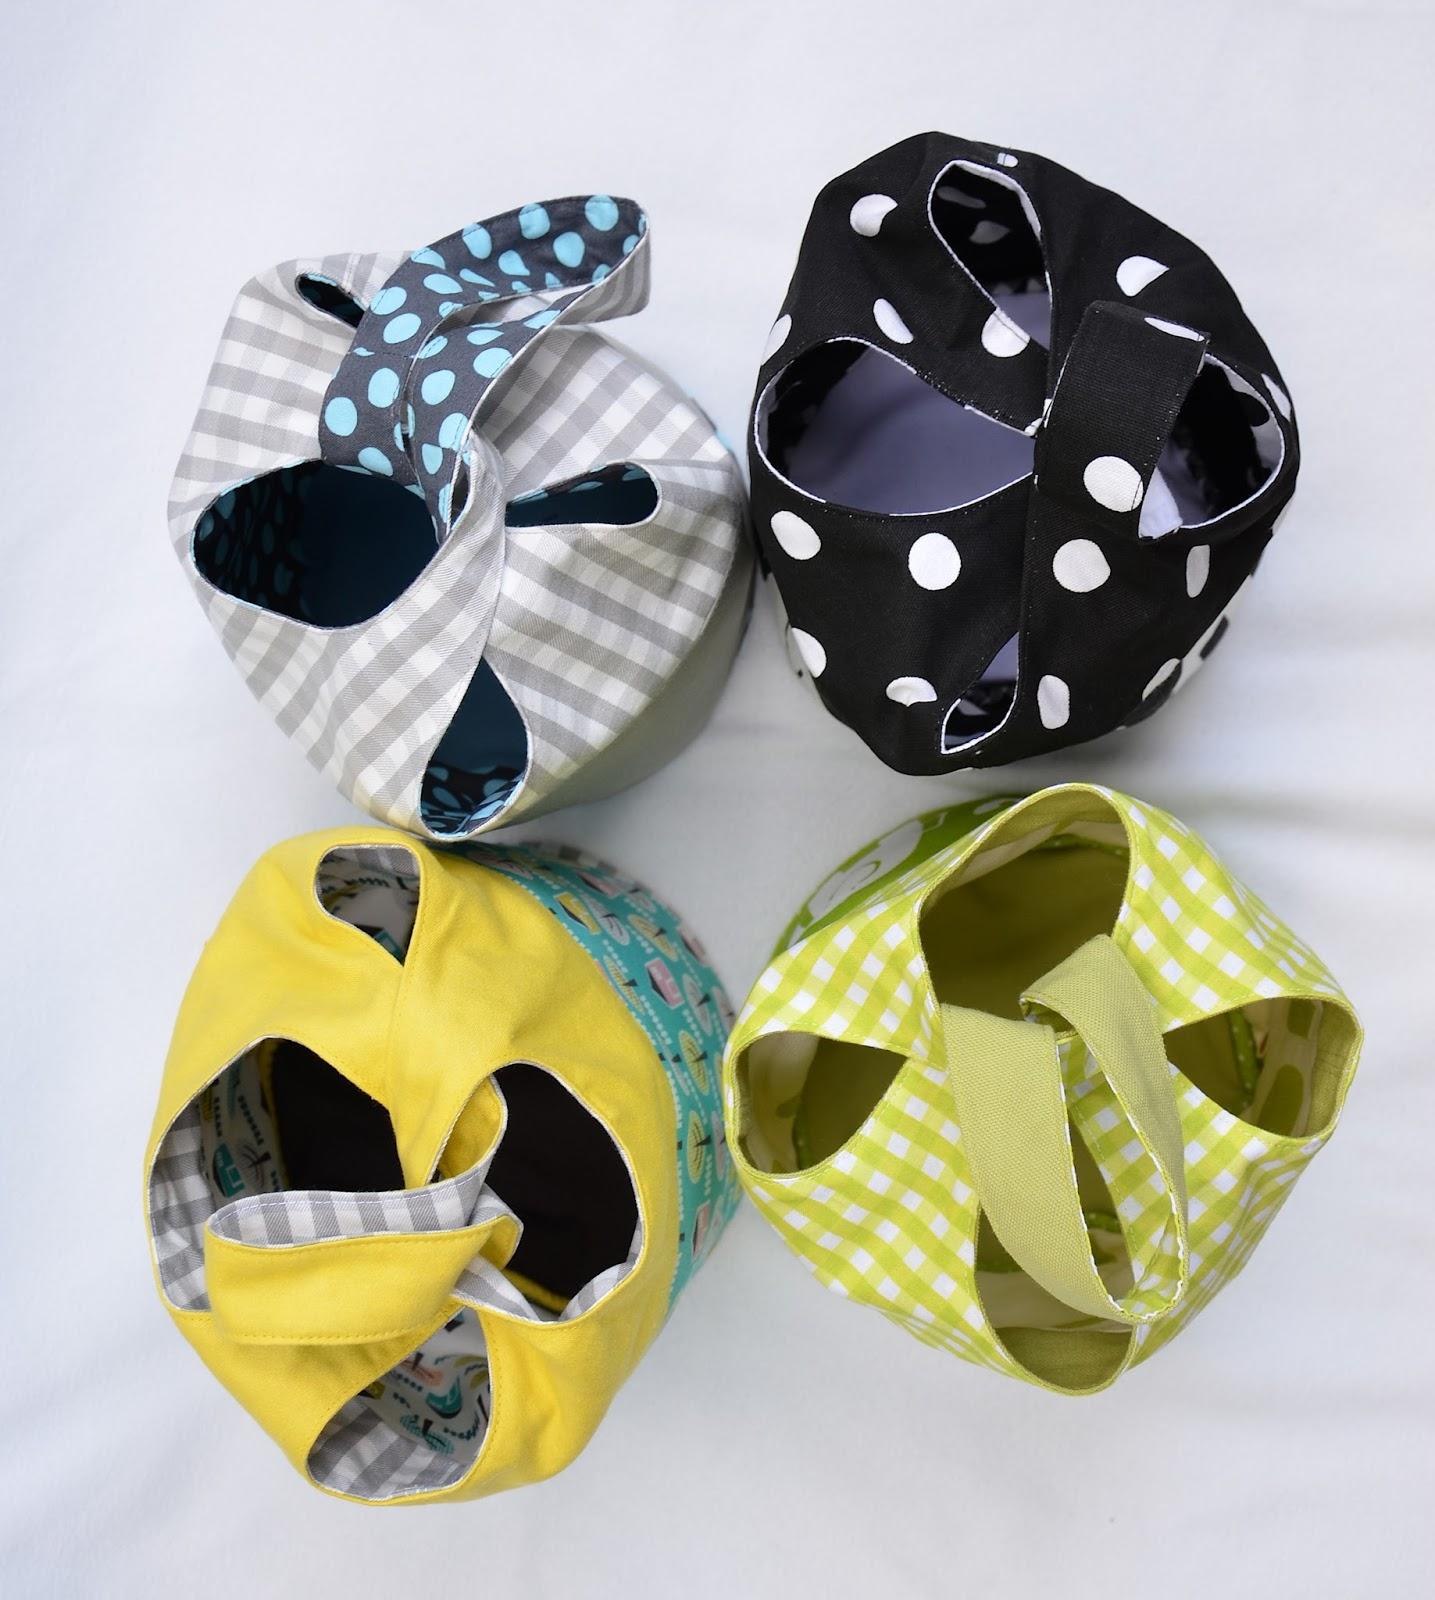 Ikat bag my cloverleaf bag tutorial at sew mama sew my cloverleaf bag tutorial at sew mama sew jeuxipadfo Image collections